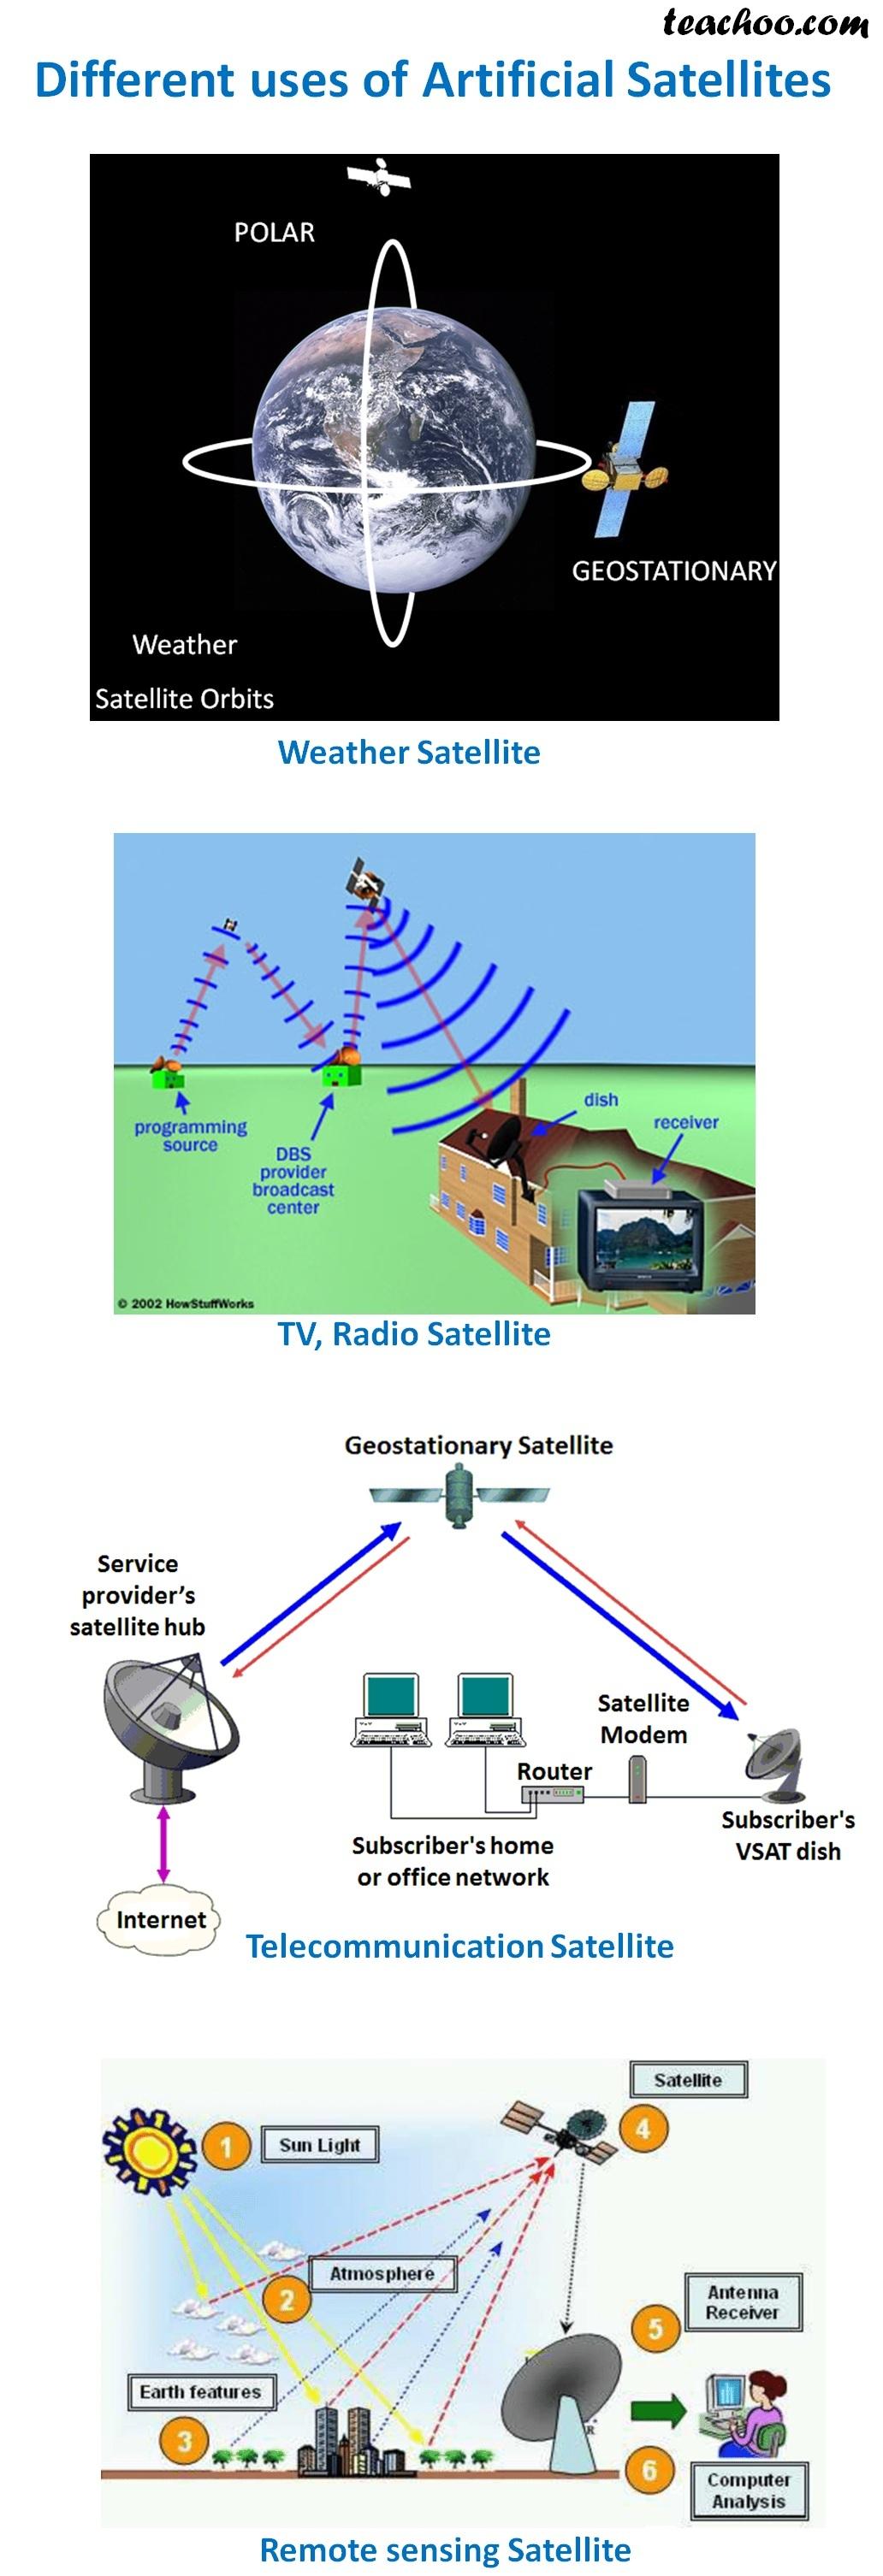 Different uses of Artificial Satellites - Teachoo.jpg